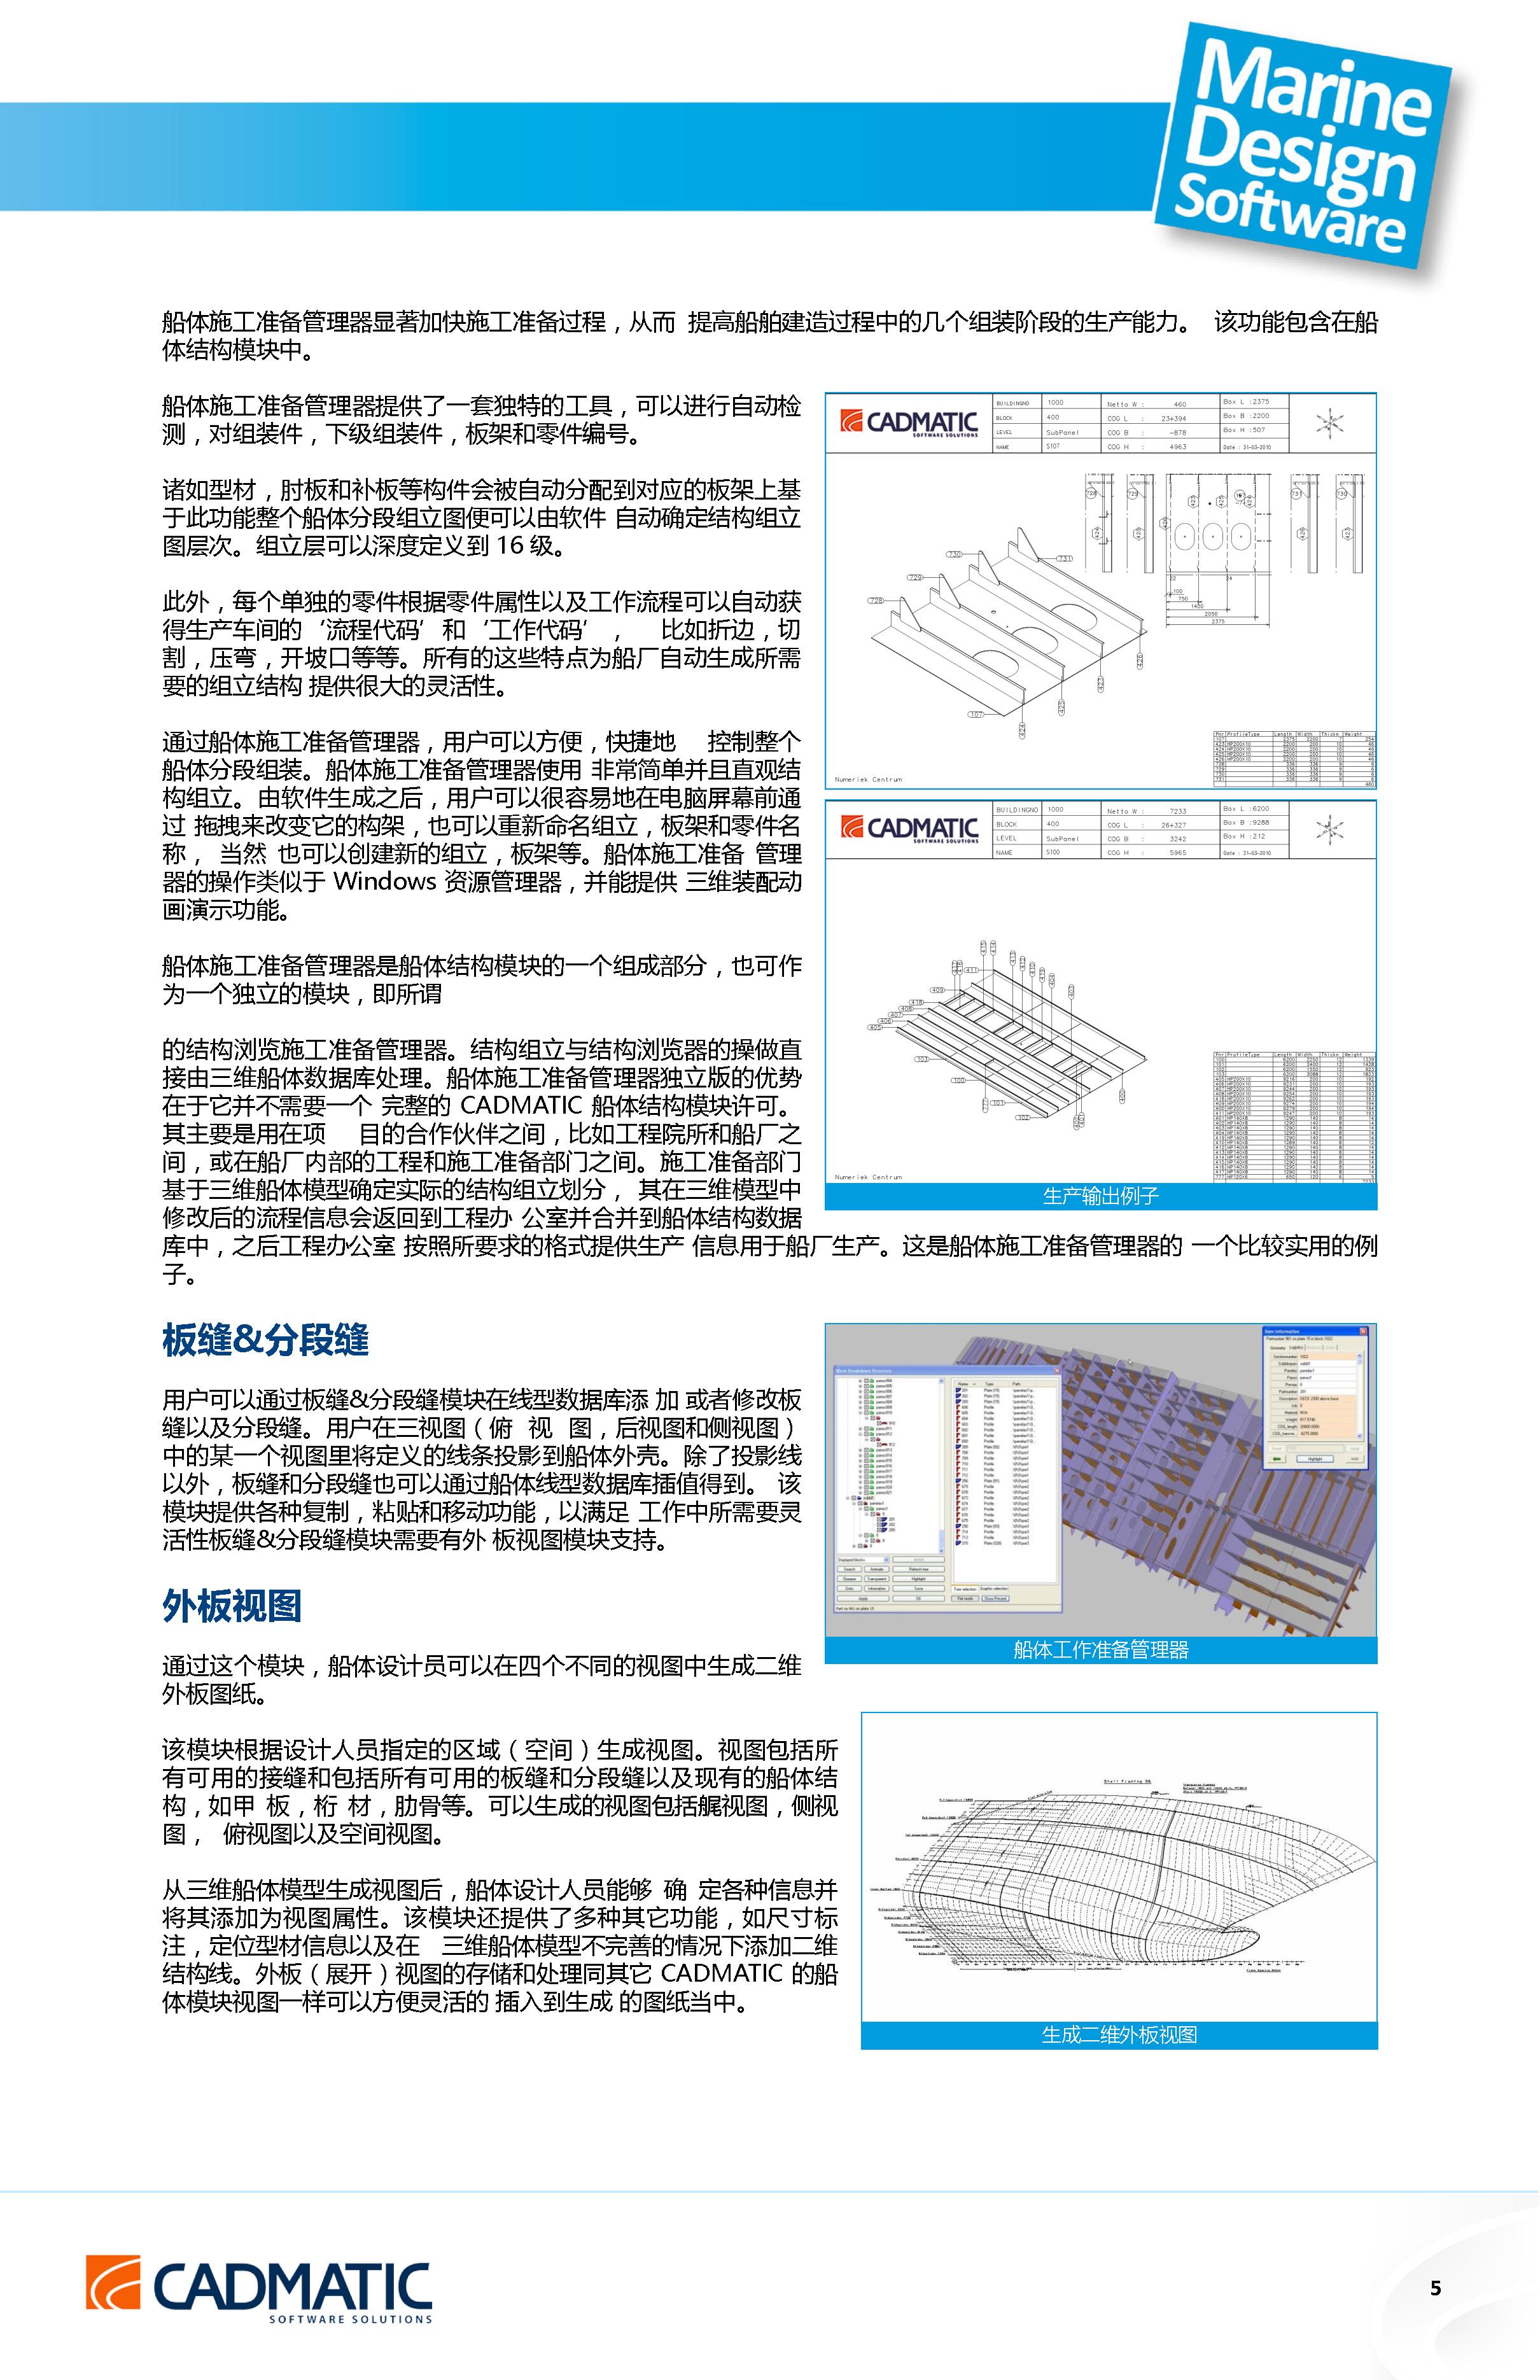 CADMATIC船体结构详细设计